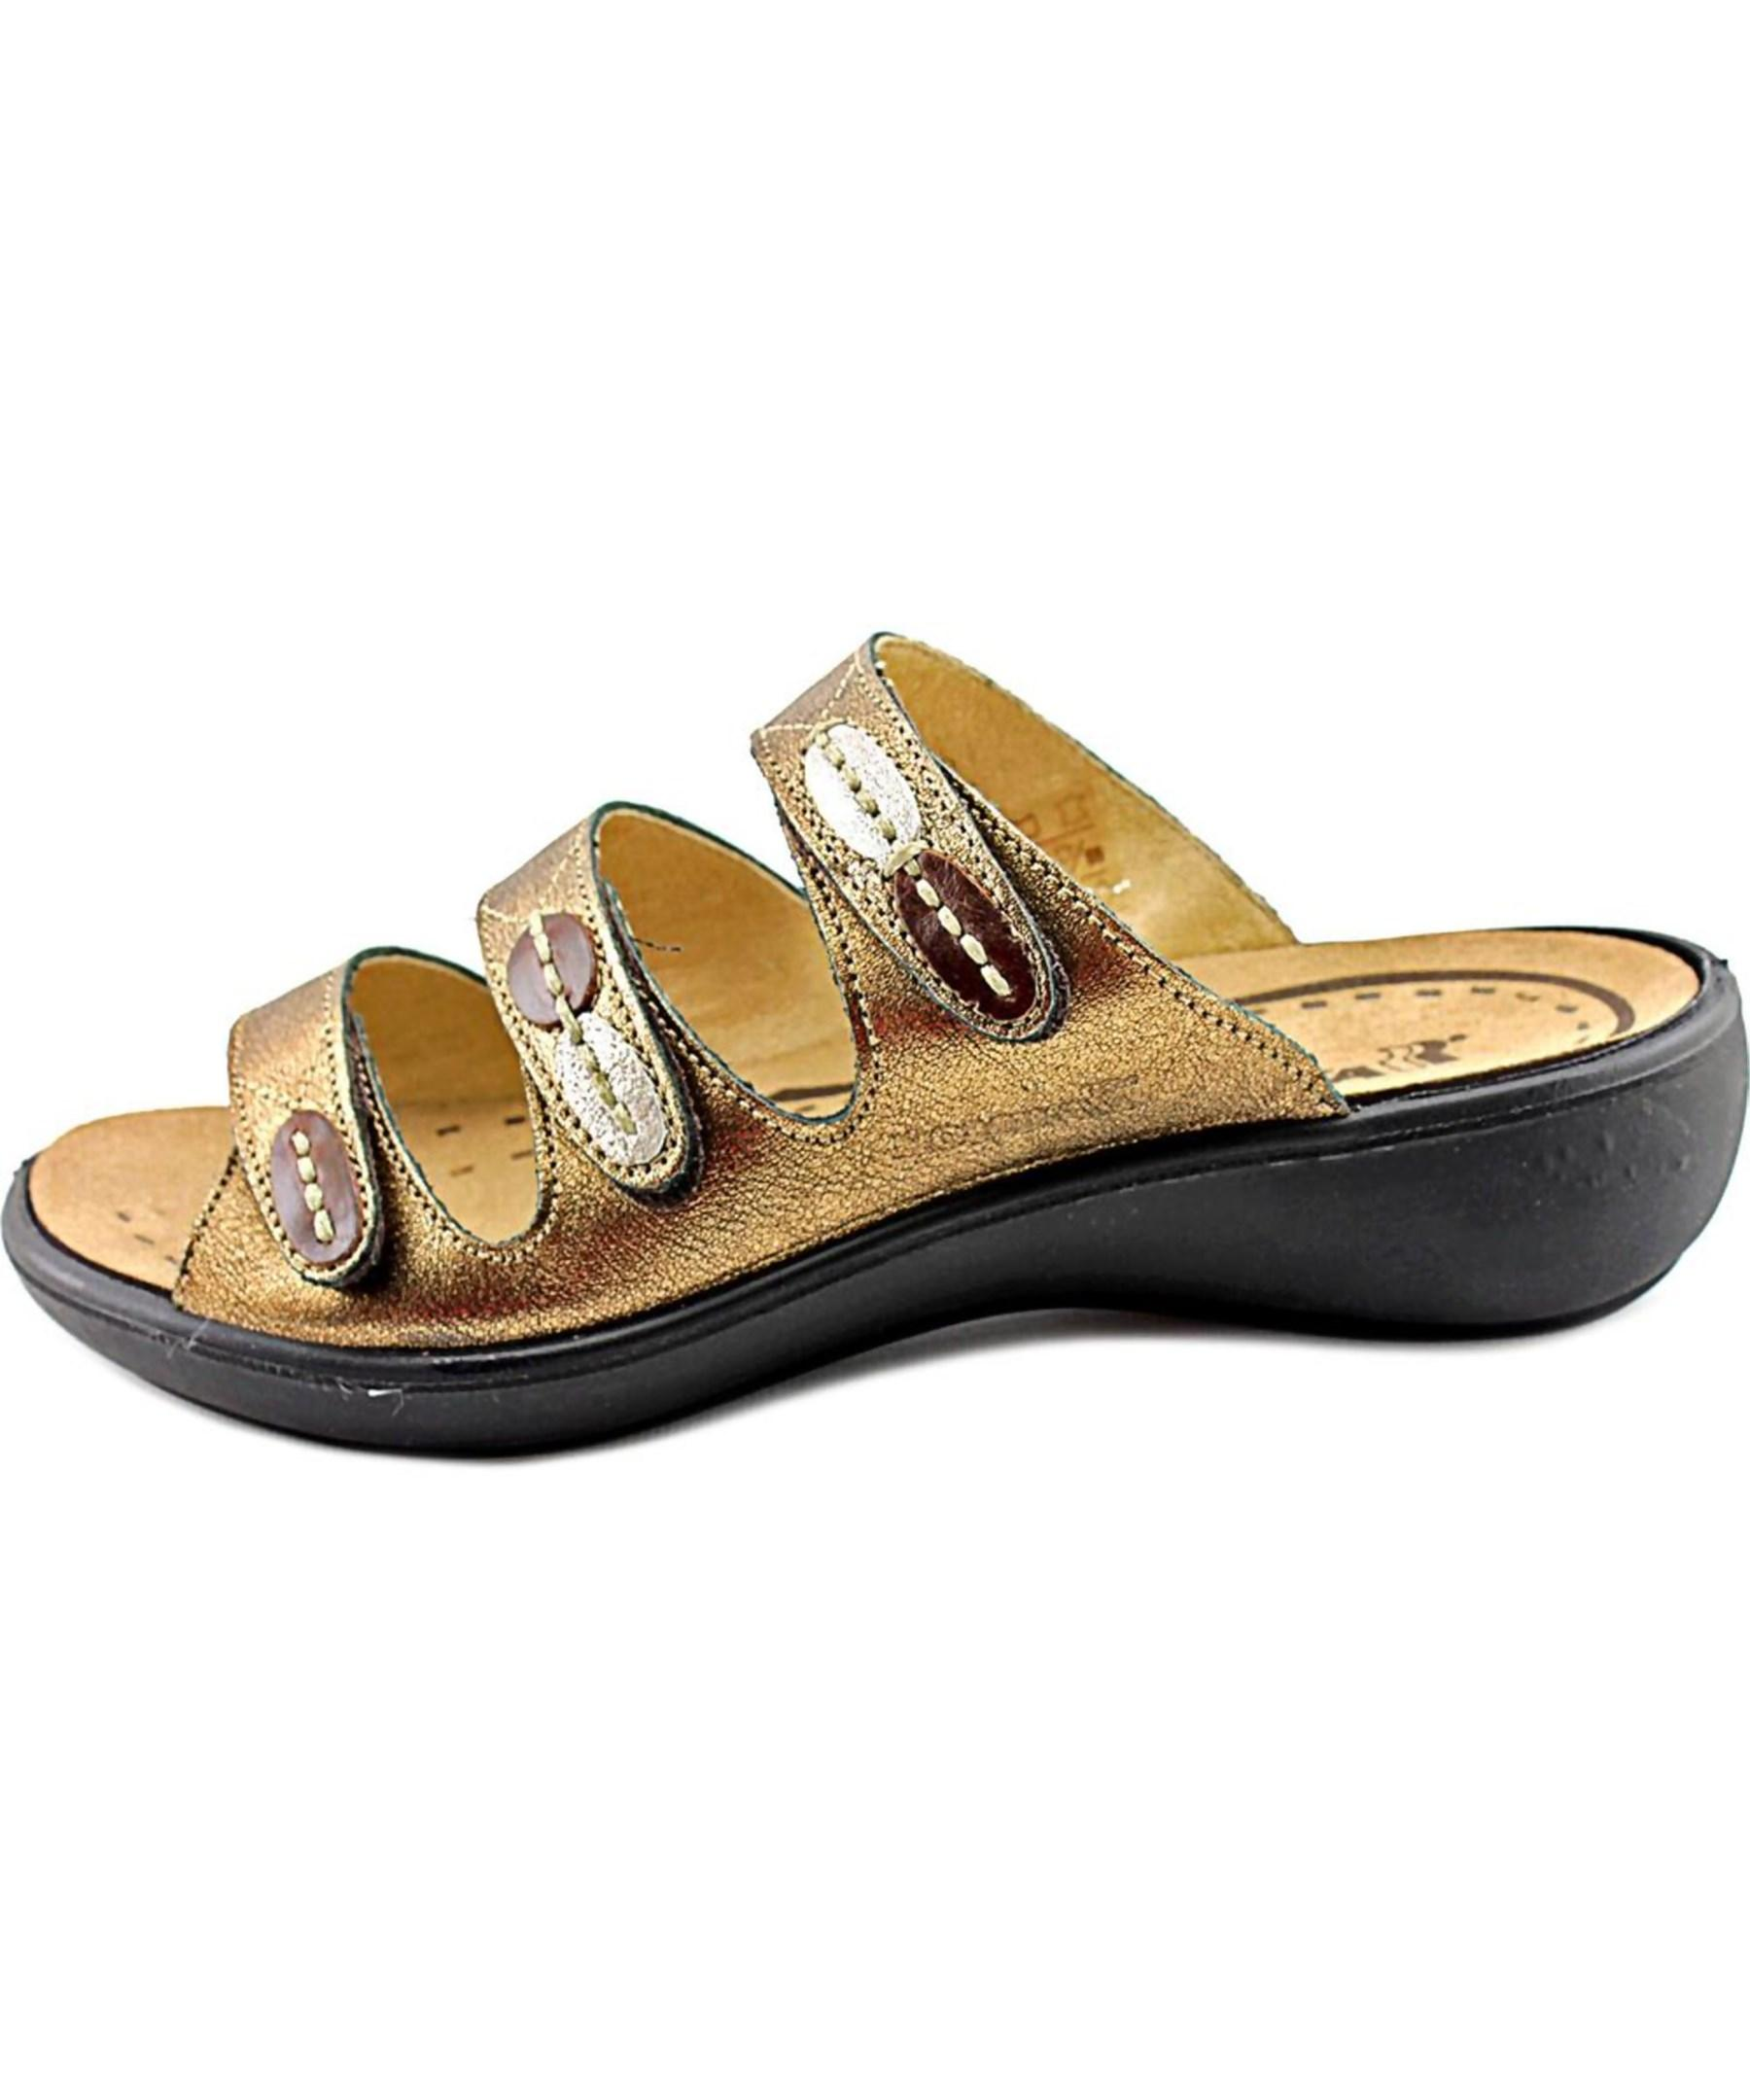 Romika Ibiza 20 Open Toe Leather Slides Sandal In Metallic